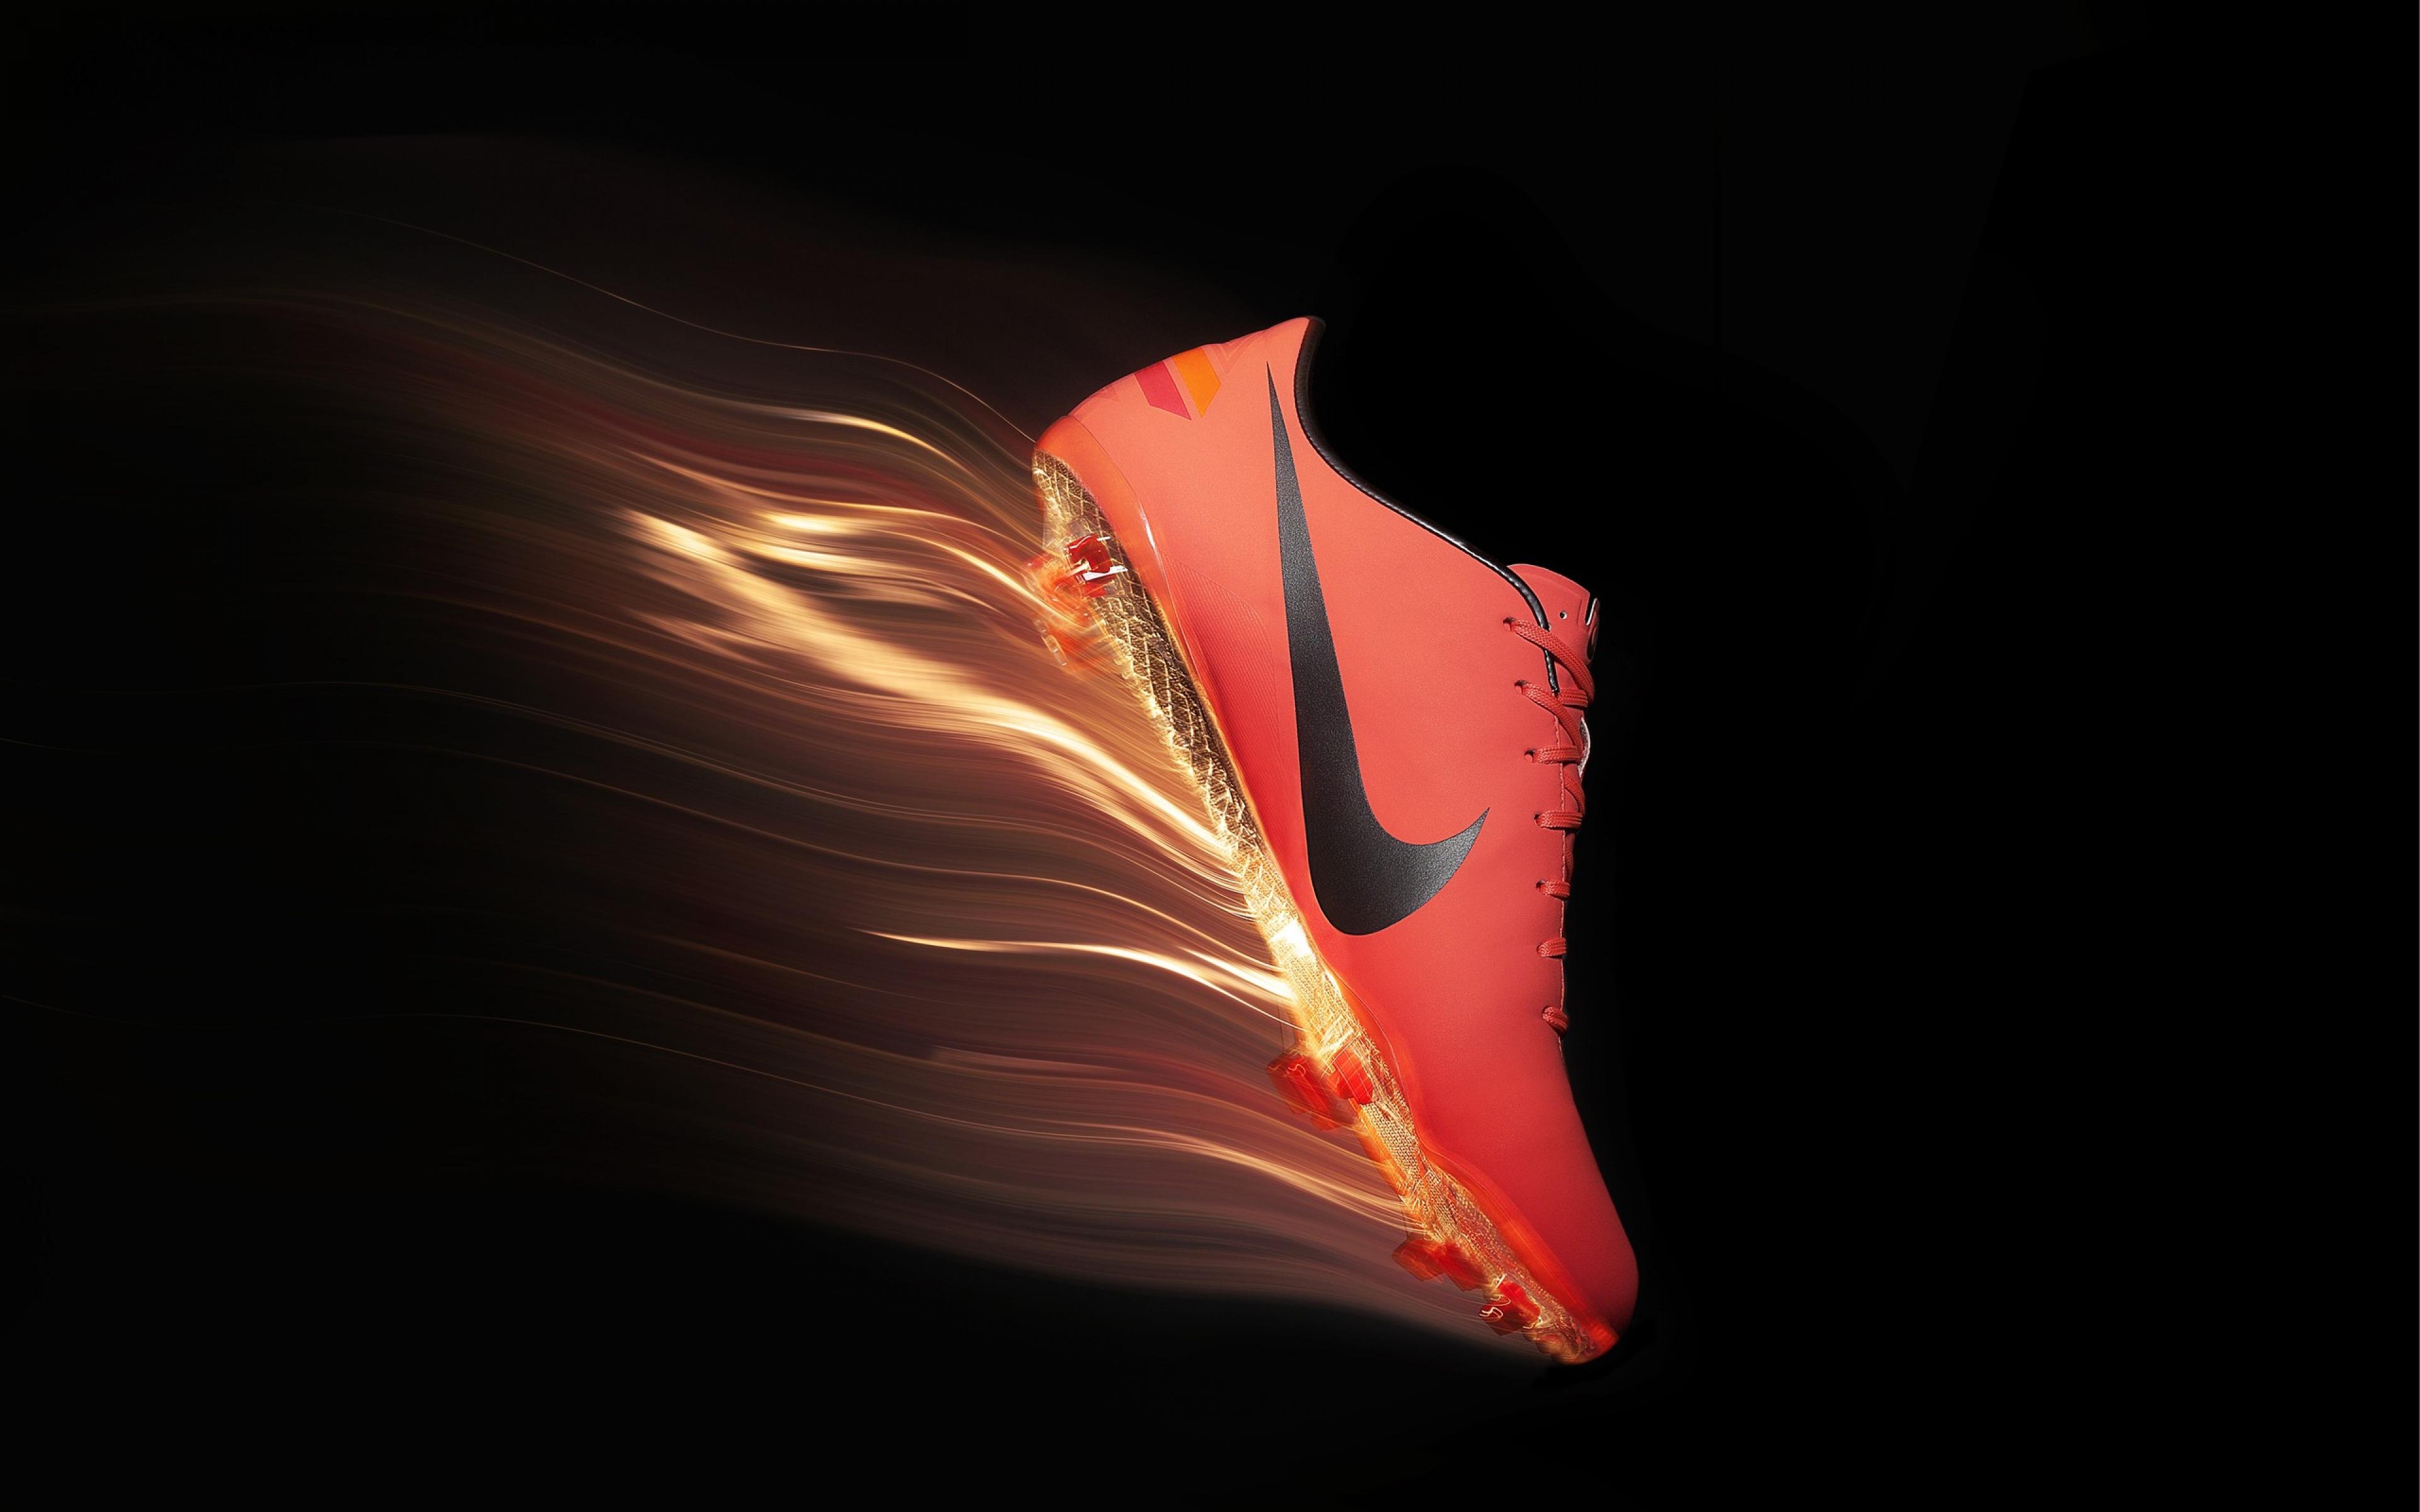 47+ Nike Smoke Wallpapers on WallpaperSafari